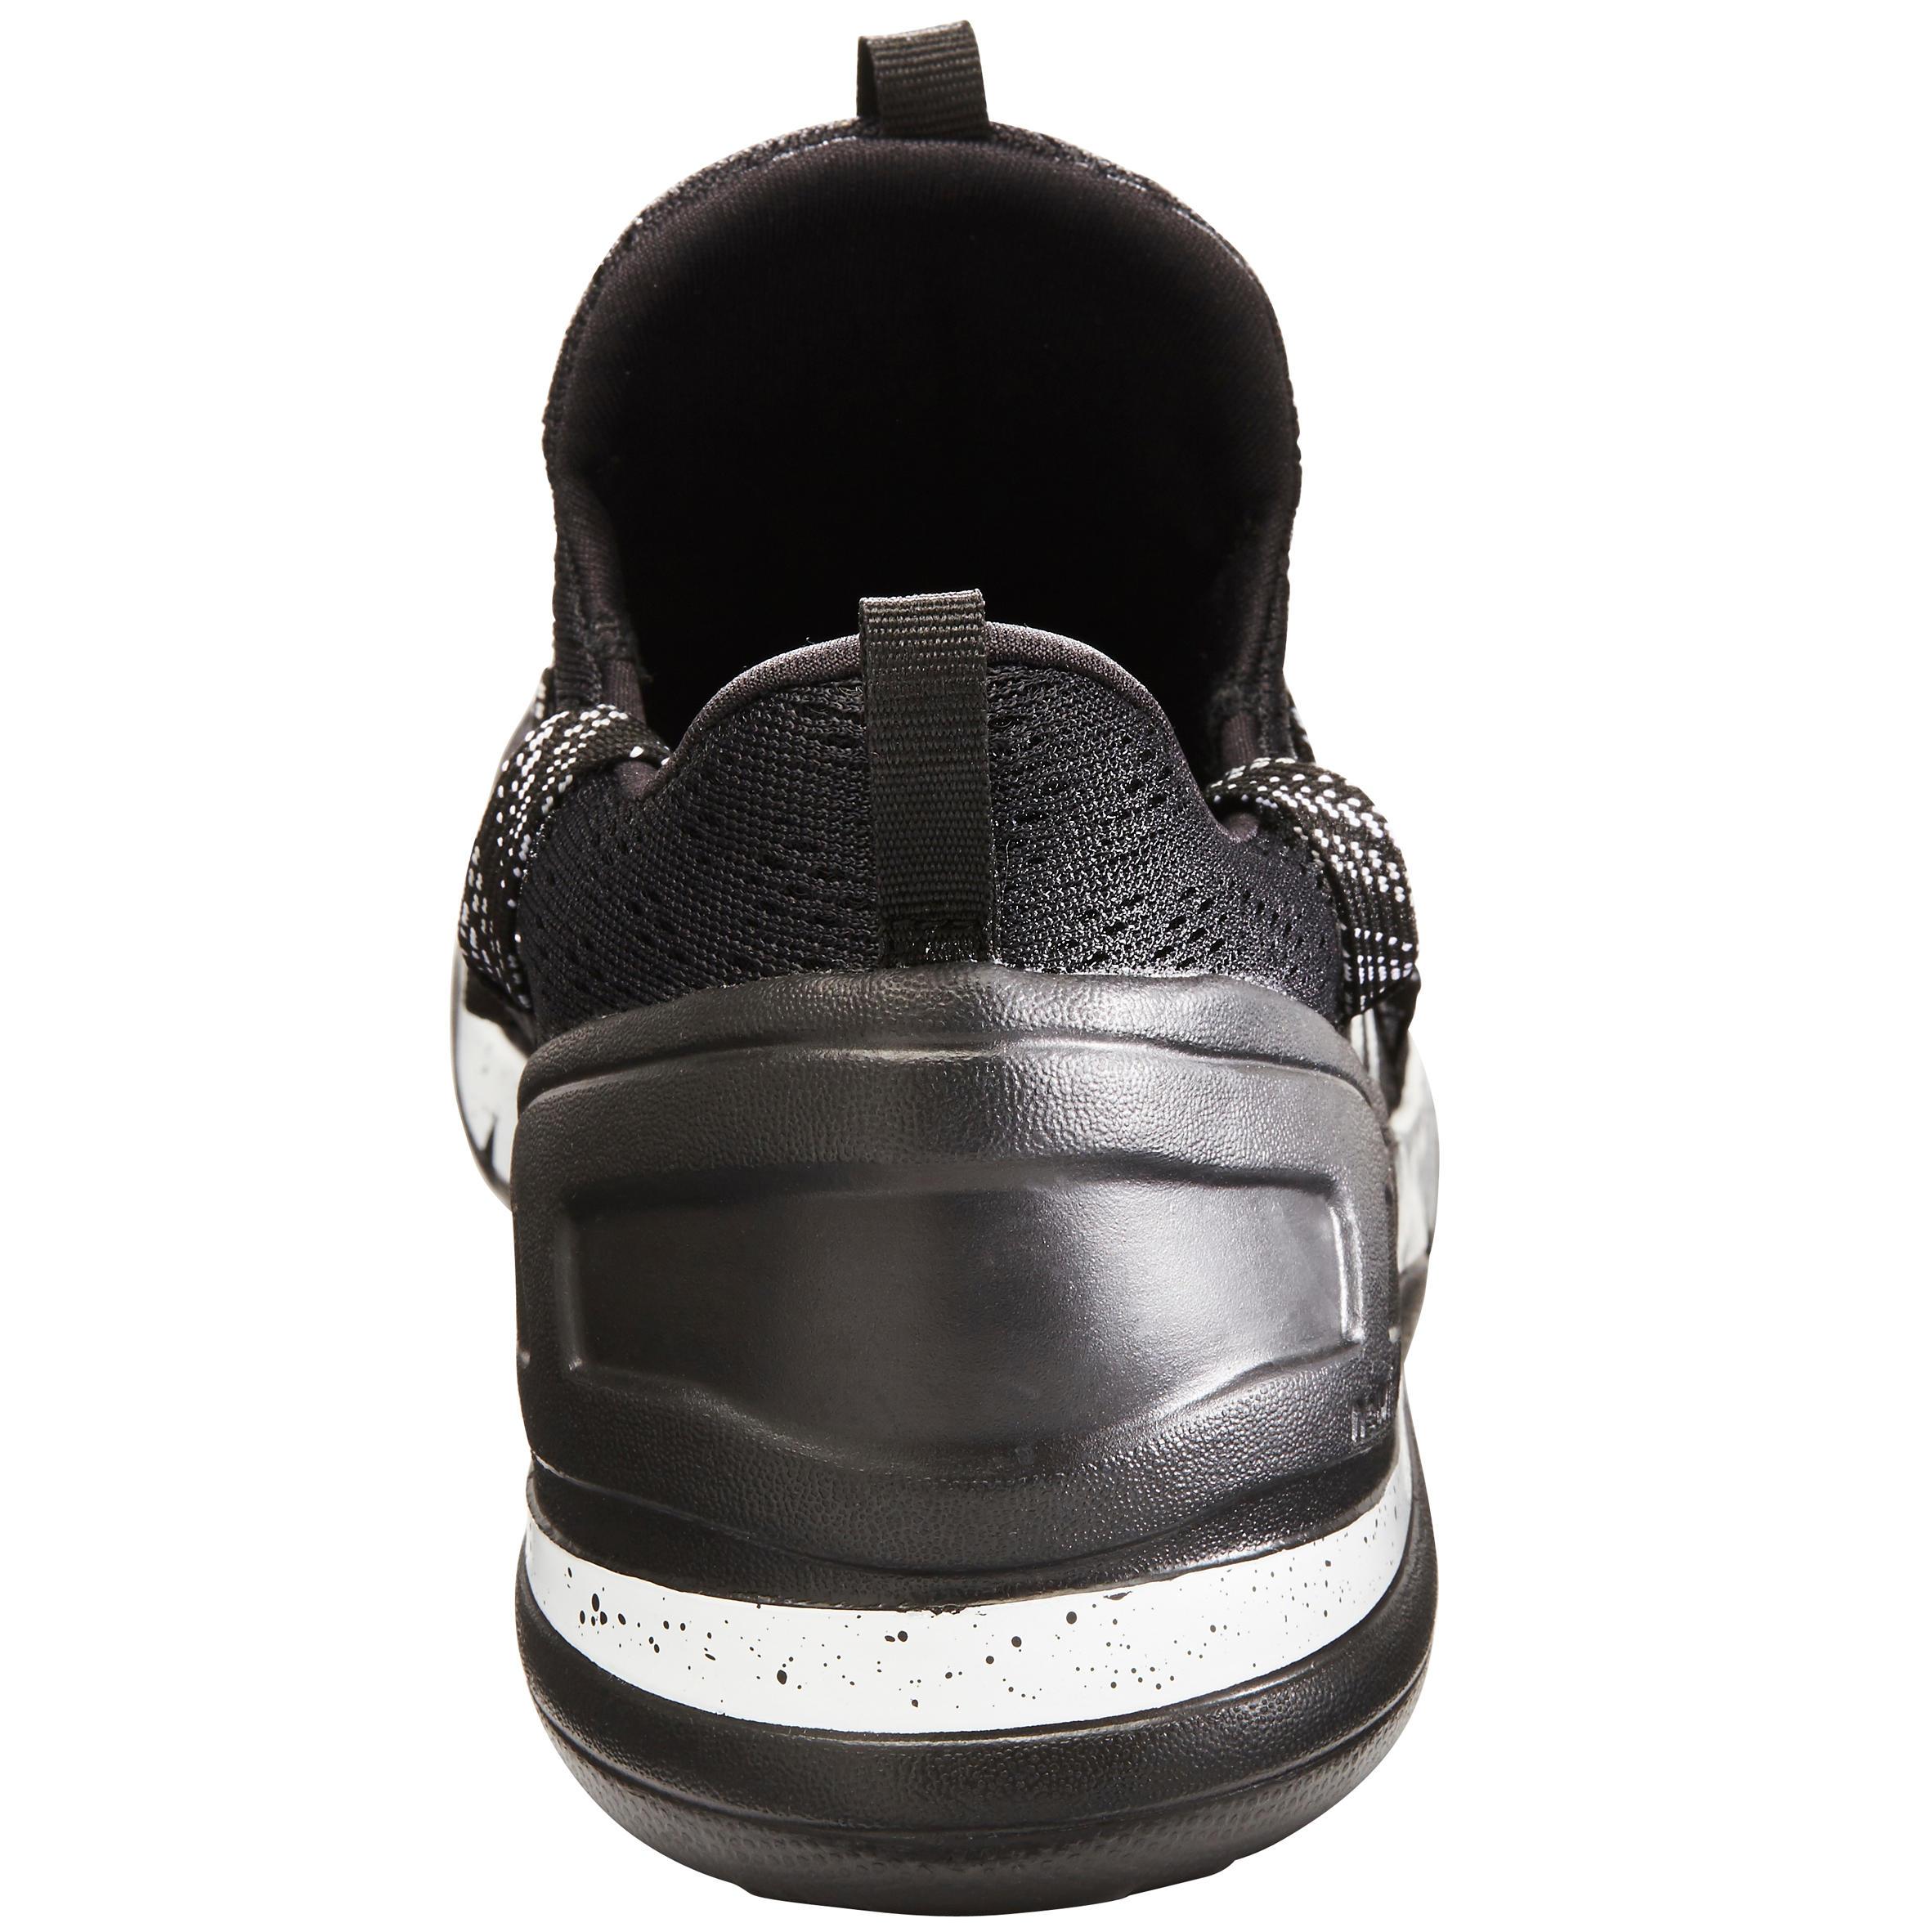 PW 140 Men's Fitness Walking Shoes - White/Black